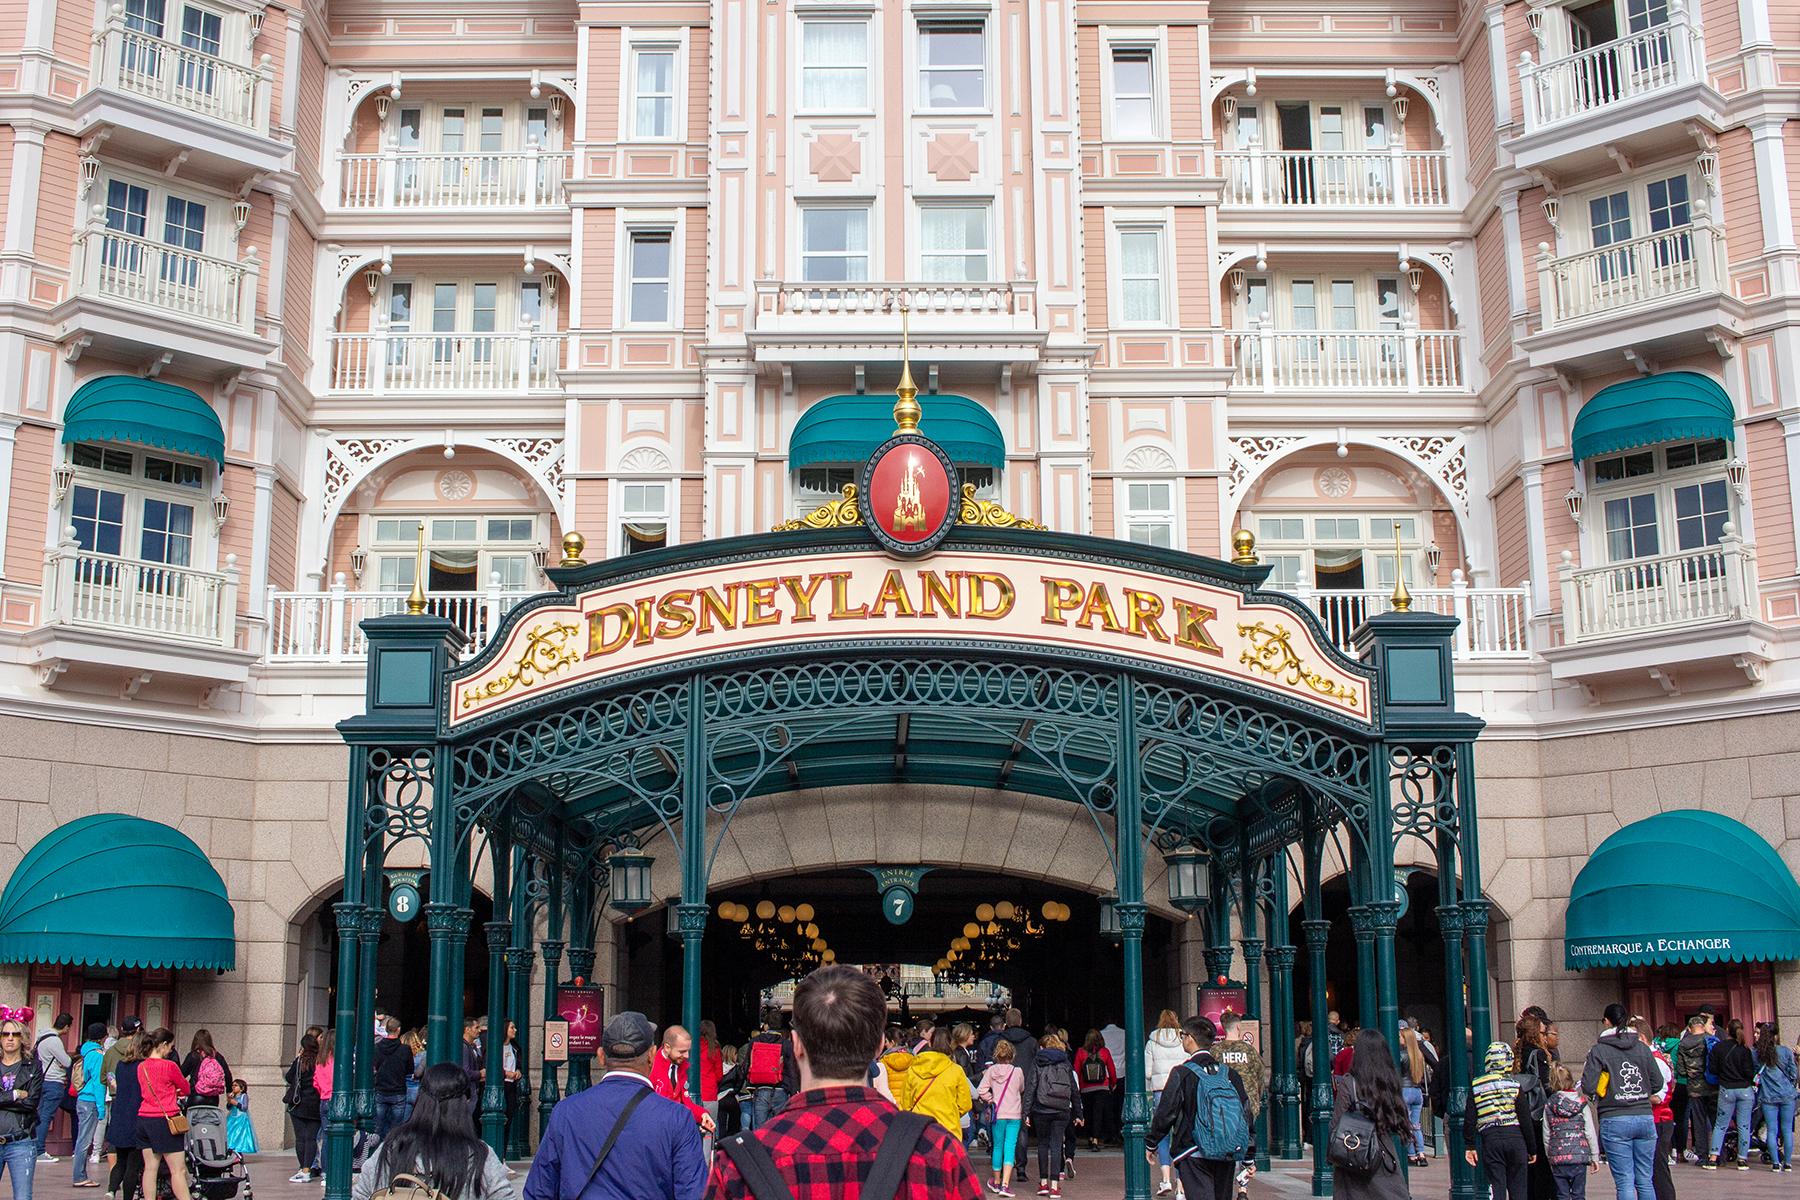 Disneyland Park sign on the Disney Hotel  | 9 Tips for Disneyland Paris